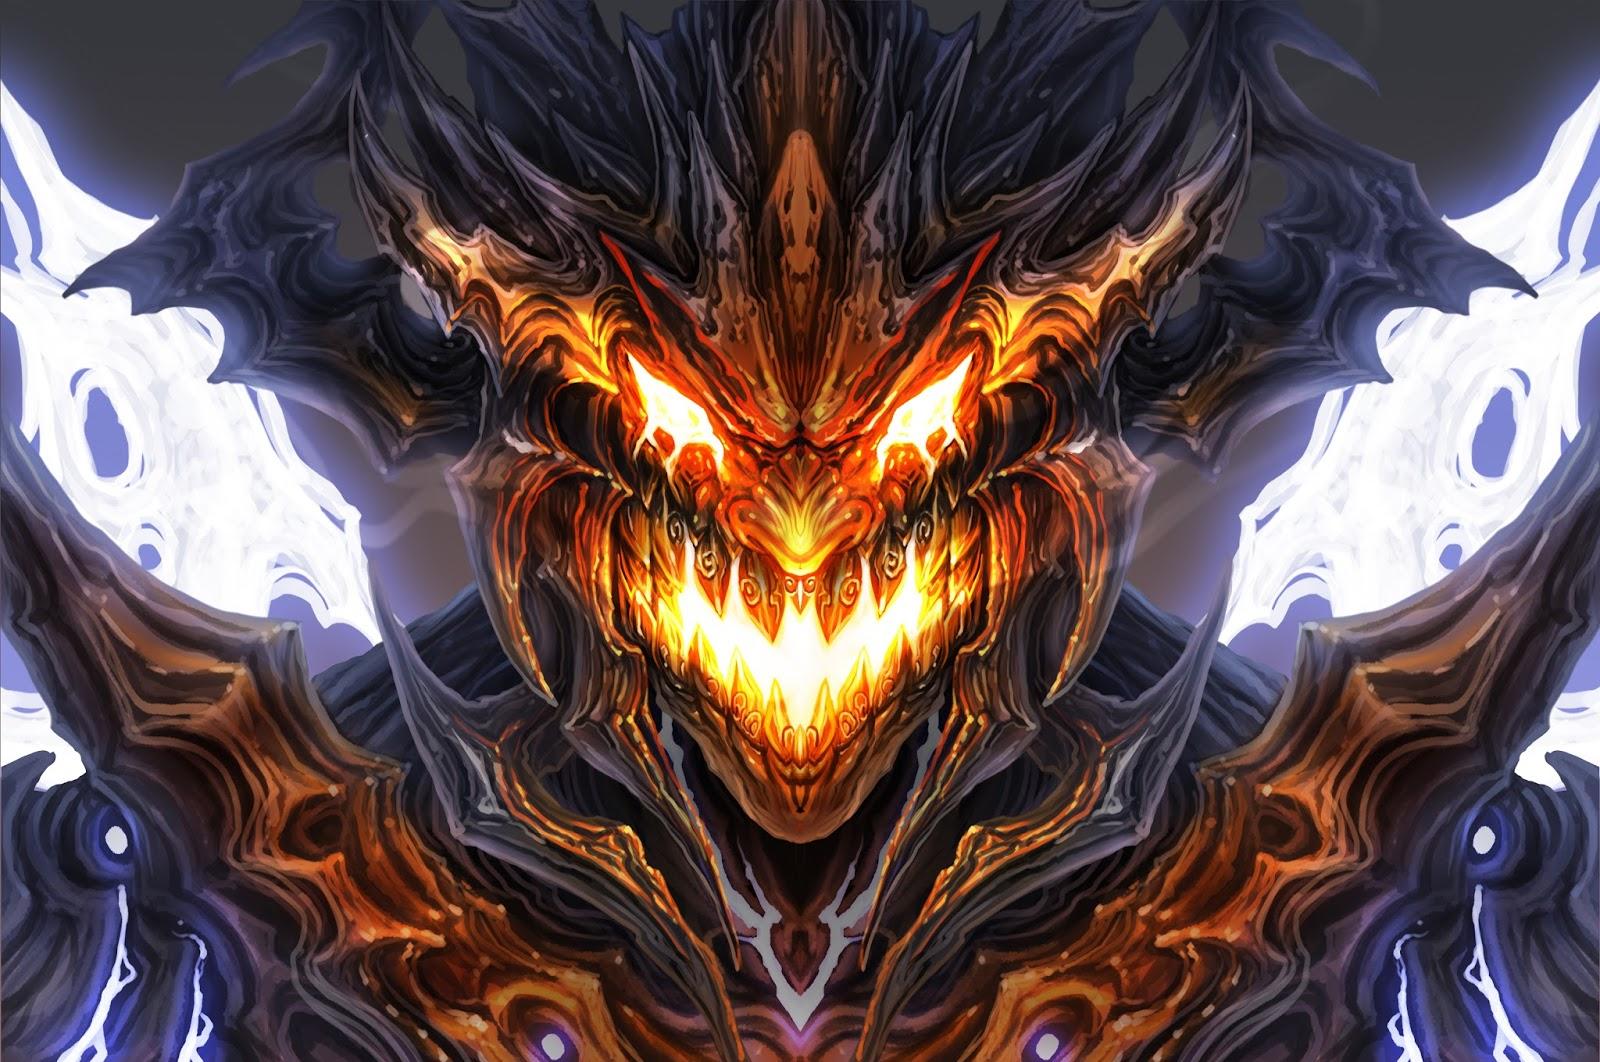 ÉPICO CAOS - DarkLord Baal Ergo